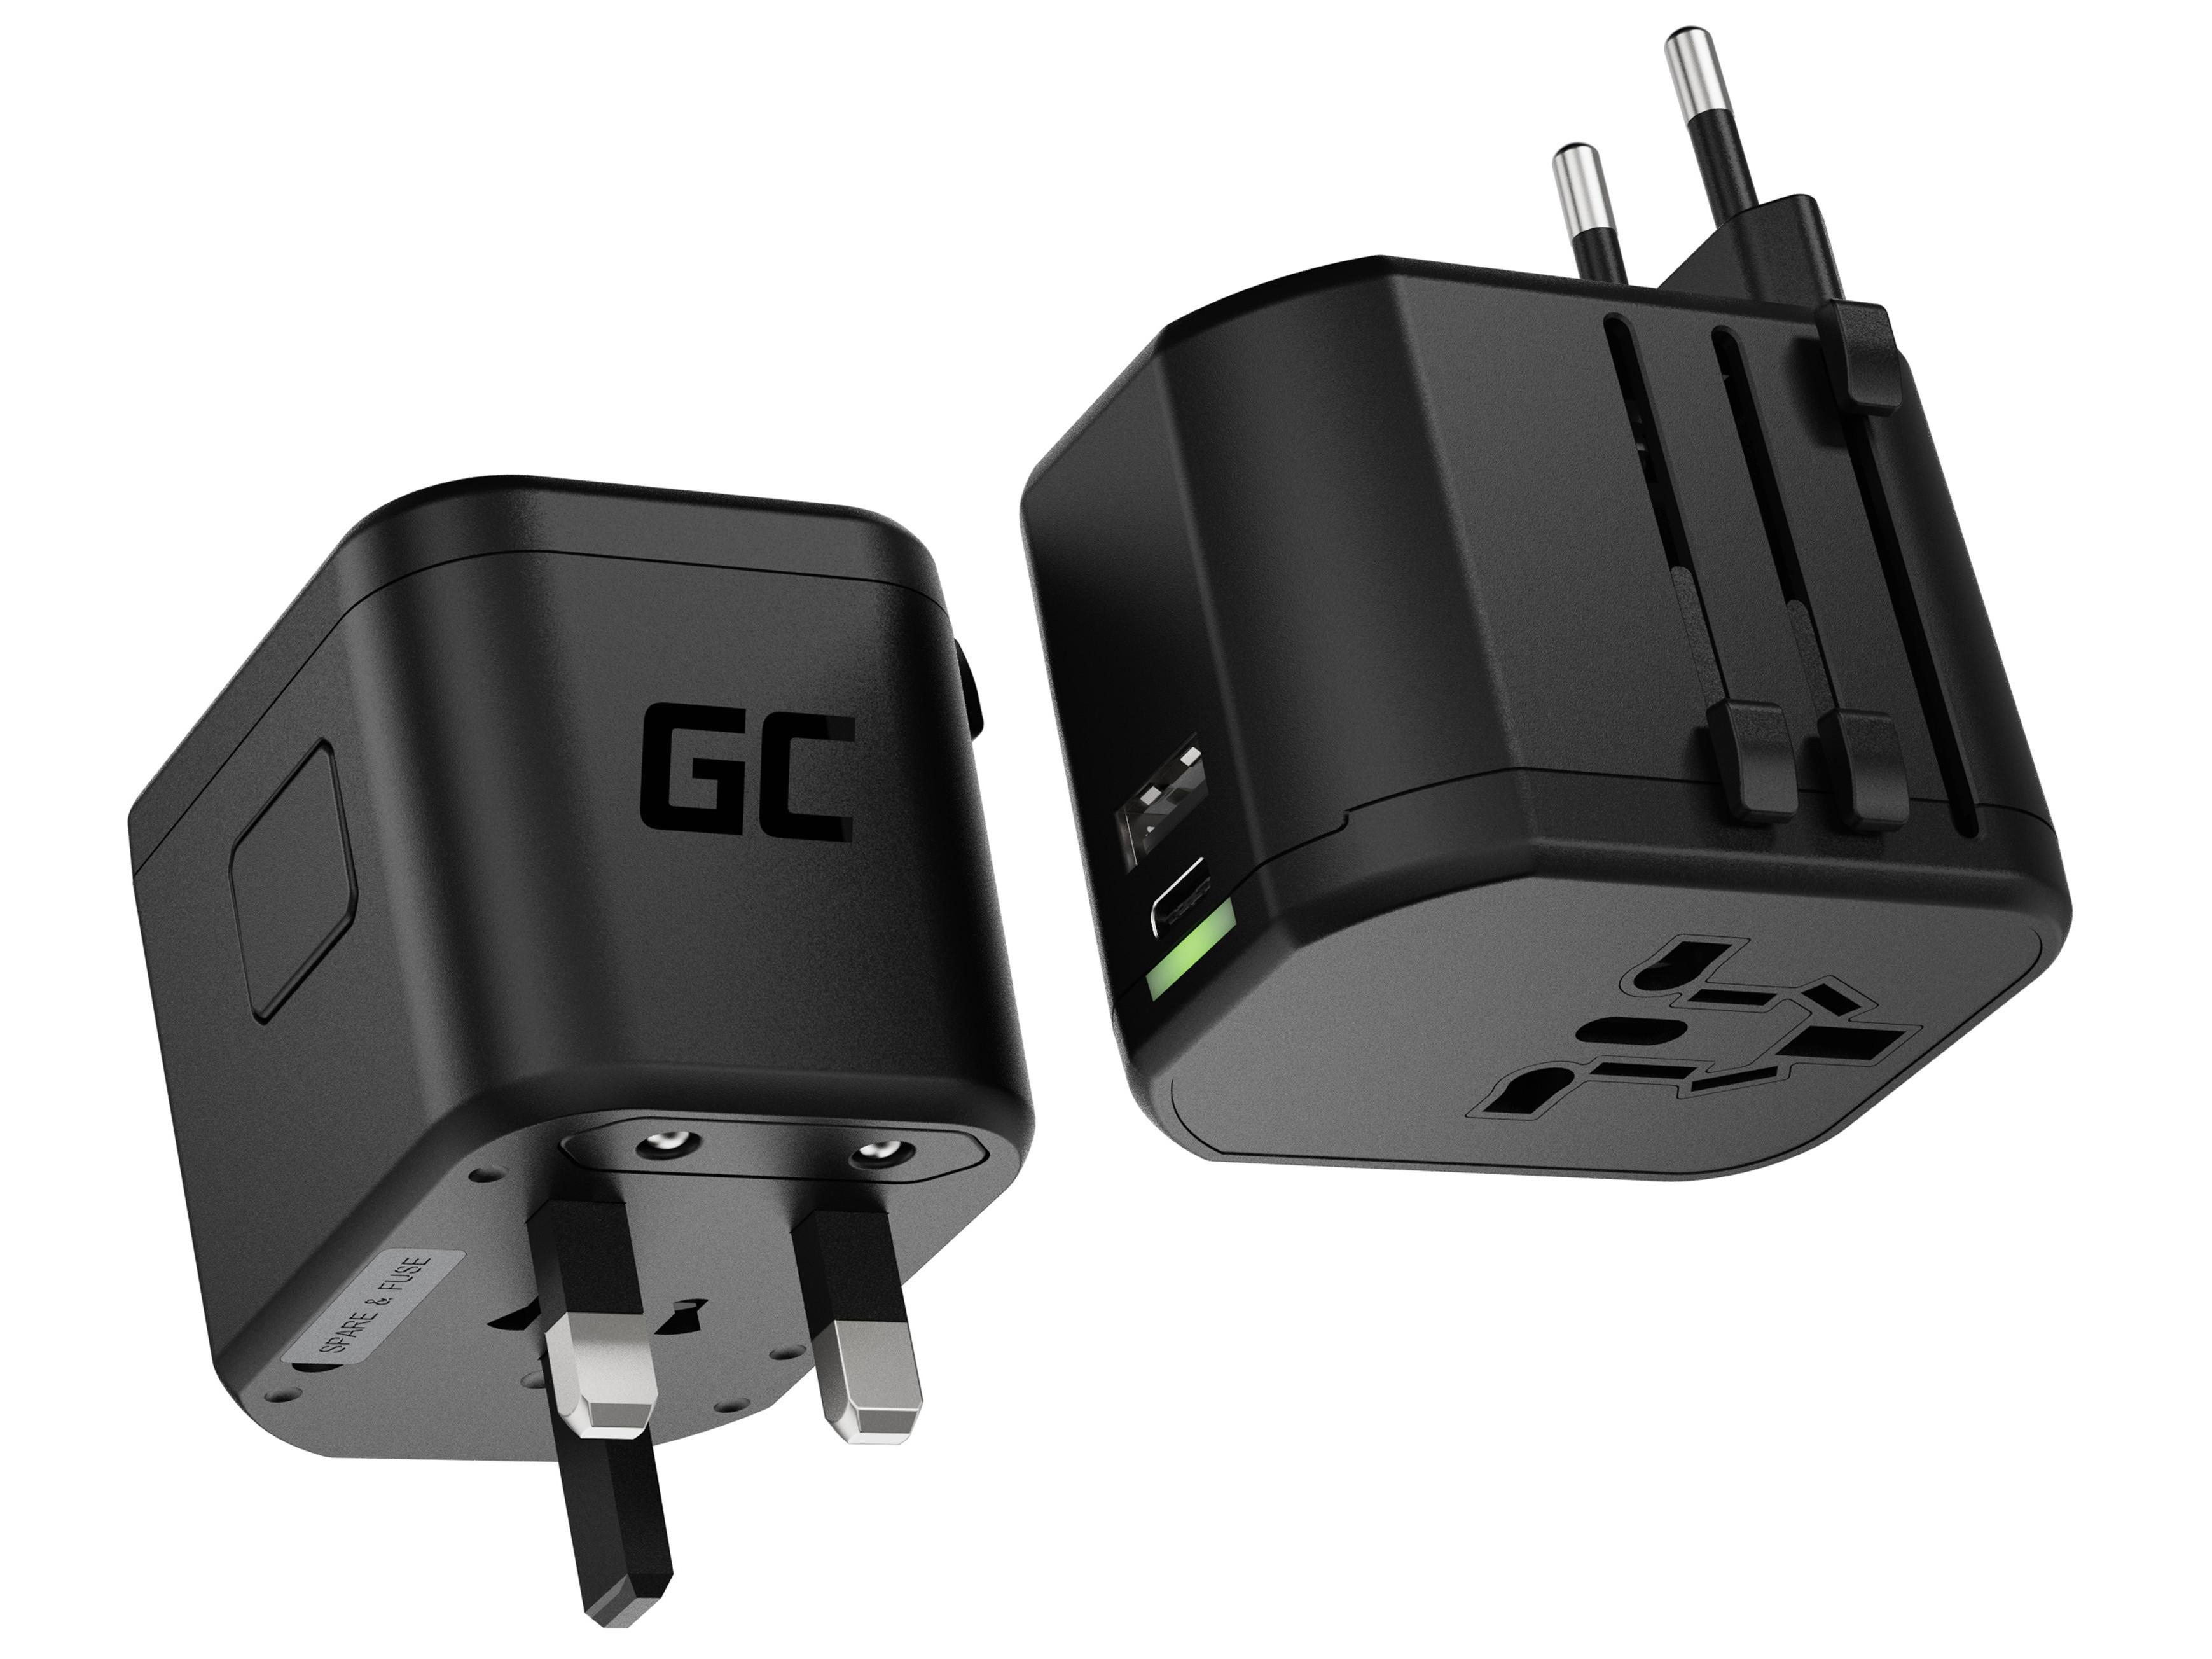 GC TripCharge PRO Universal adapter med USB-A UC- och USB-C PD 18W-portar